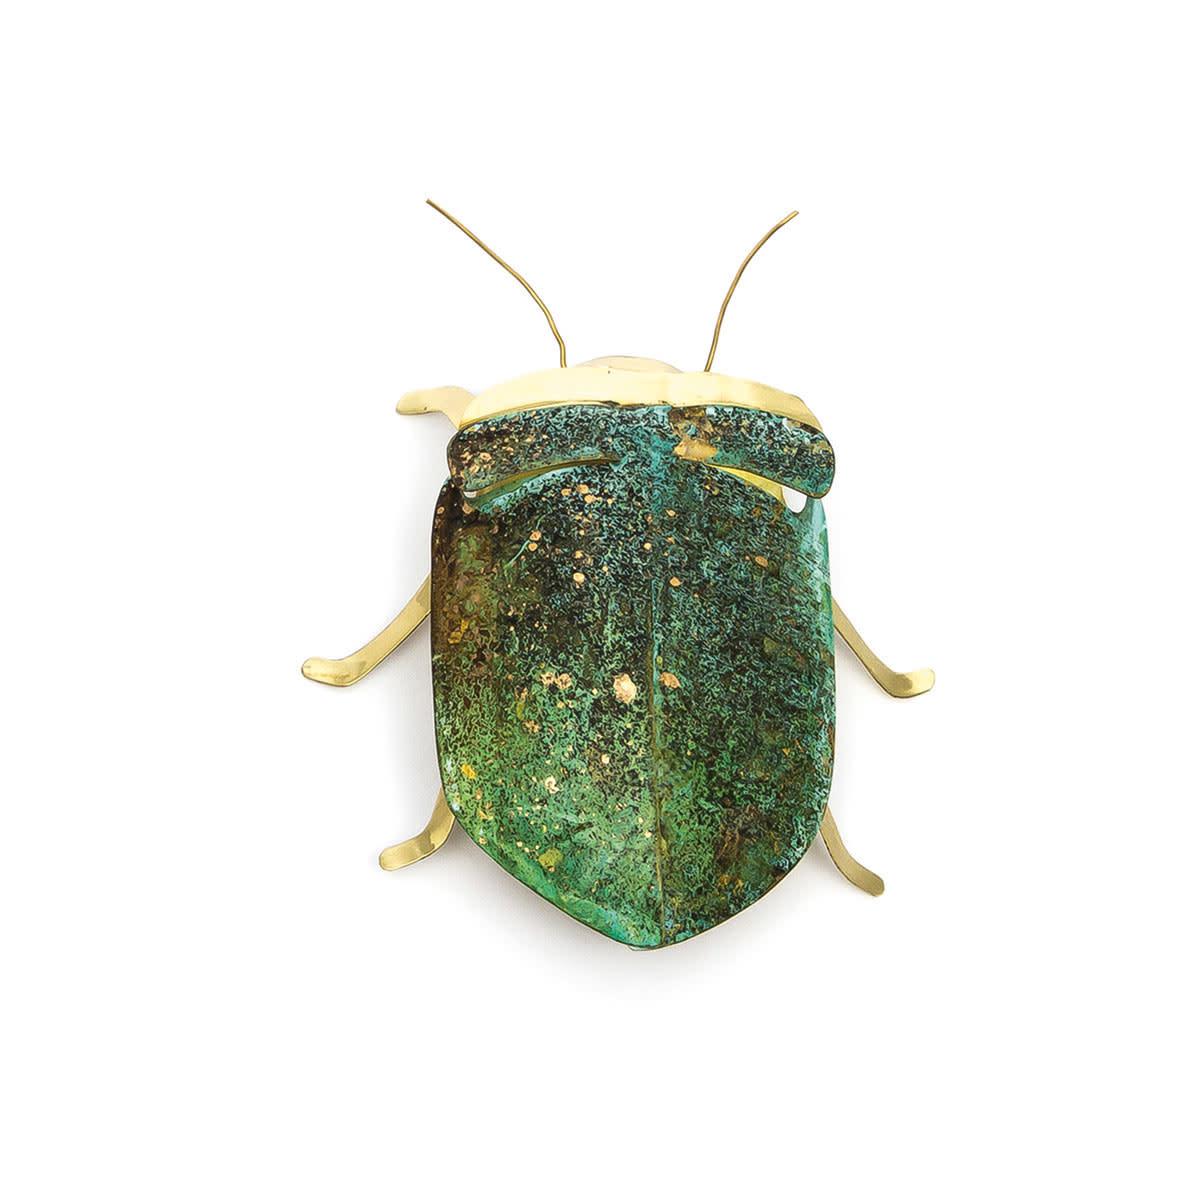 Sibilia Handicraft Brass Bug: Beetle LG Forest